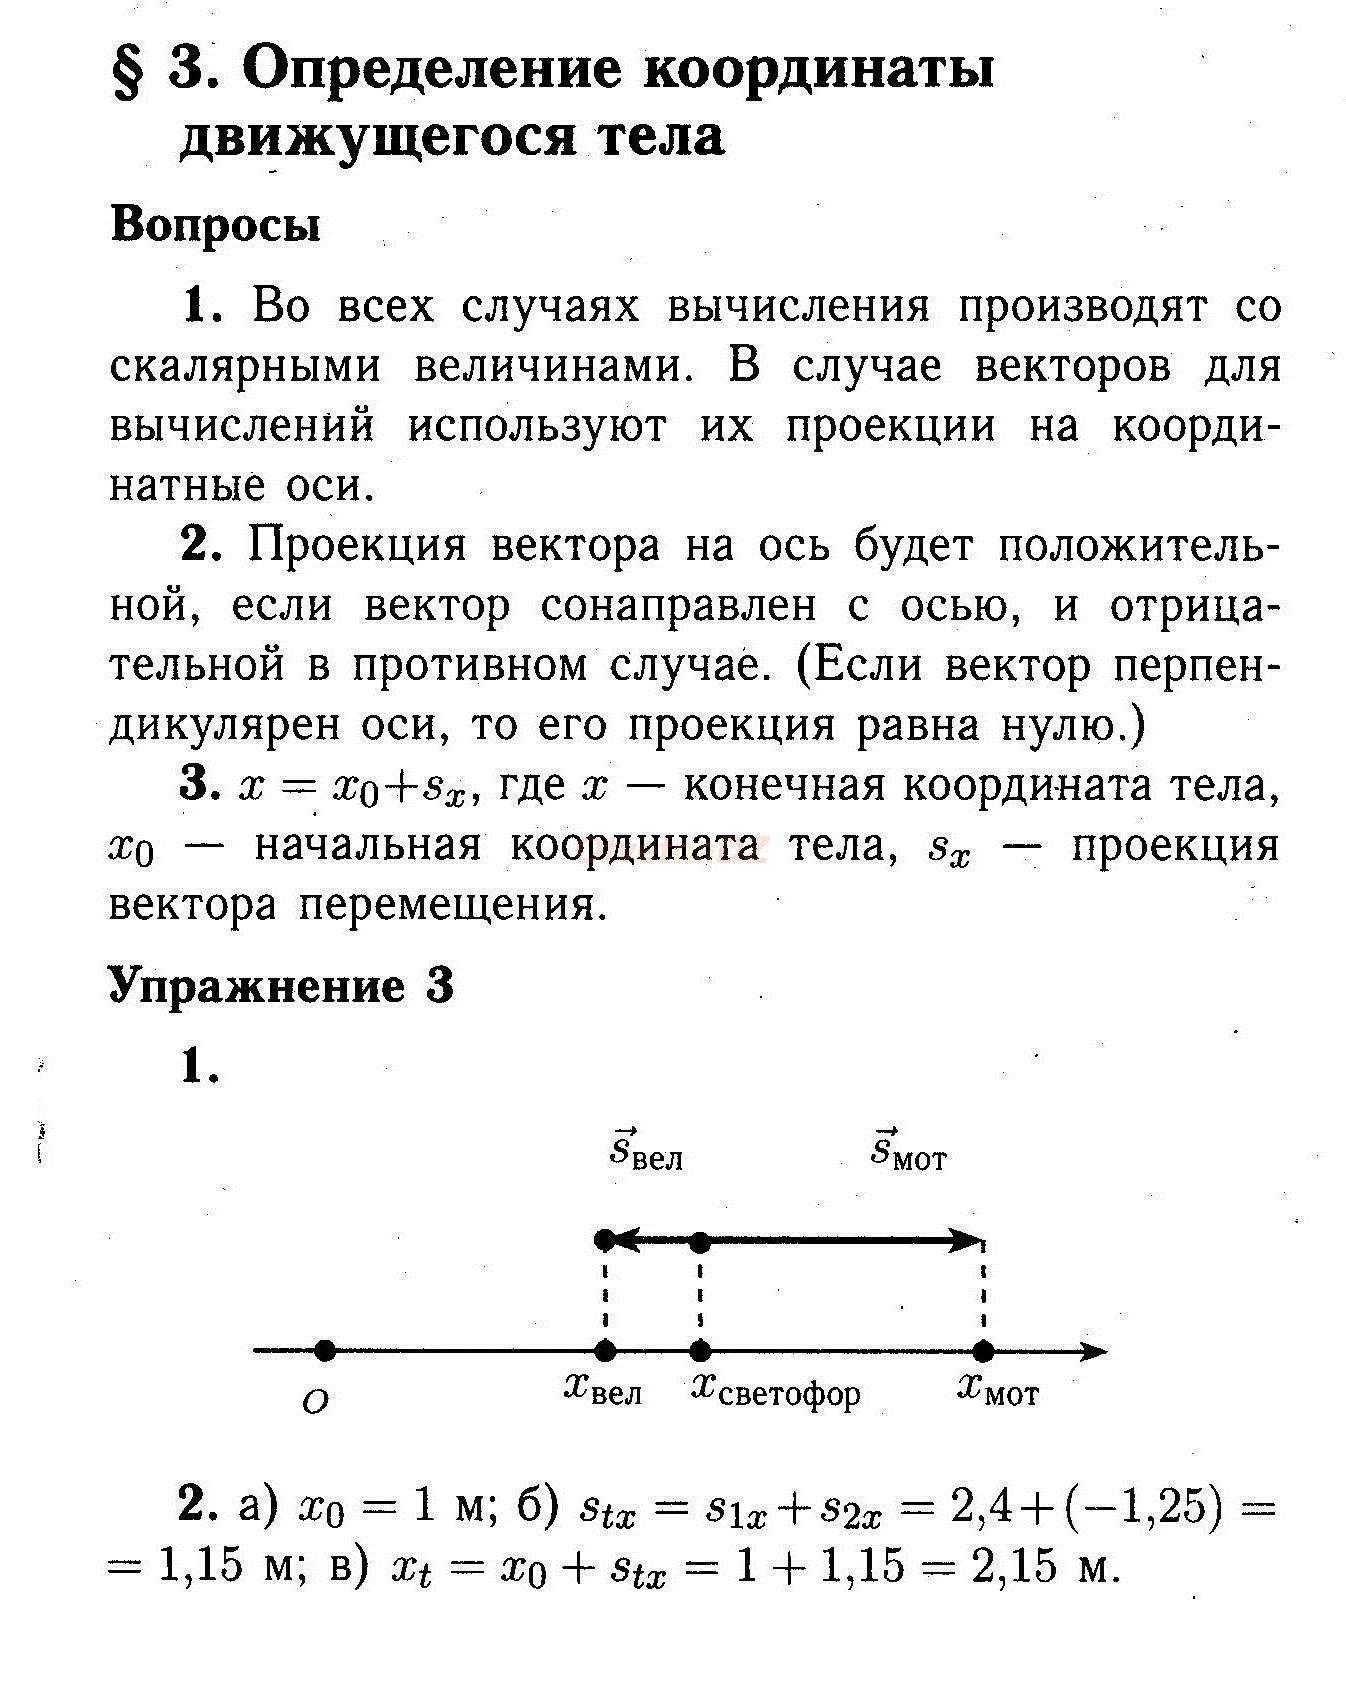 Физика 9 класс пёрышки домашнее задание